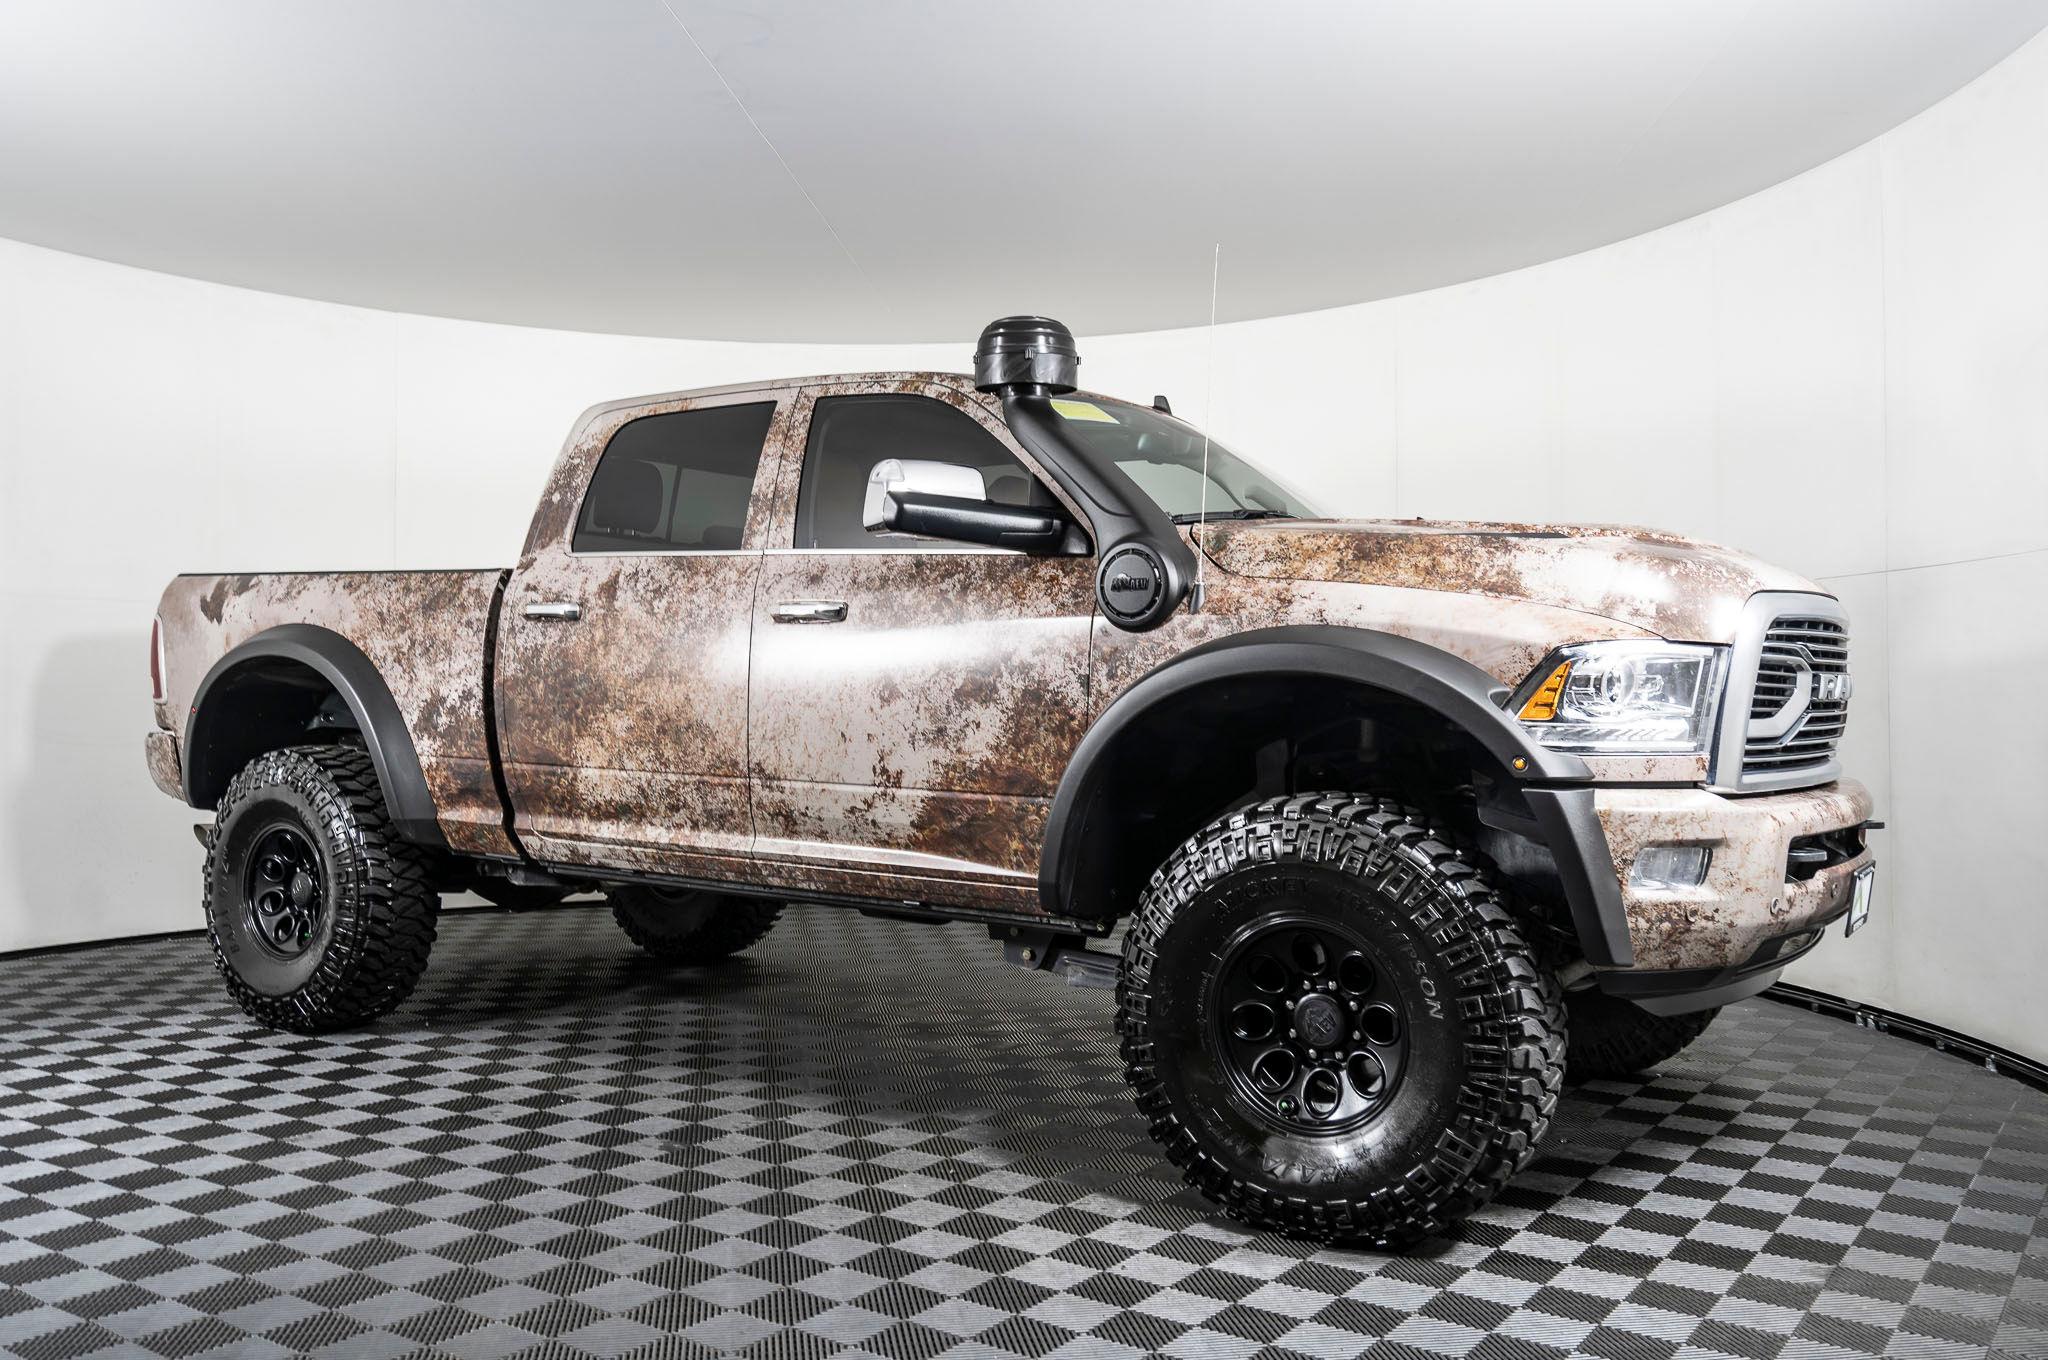 Used Lifted 2018 Dodge Ram 2500 Longhorn 4x4 Diesel Truck For Sale Northwest Motorsport